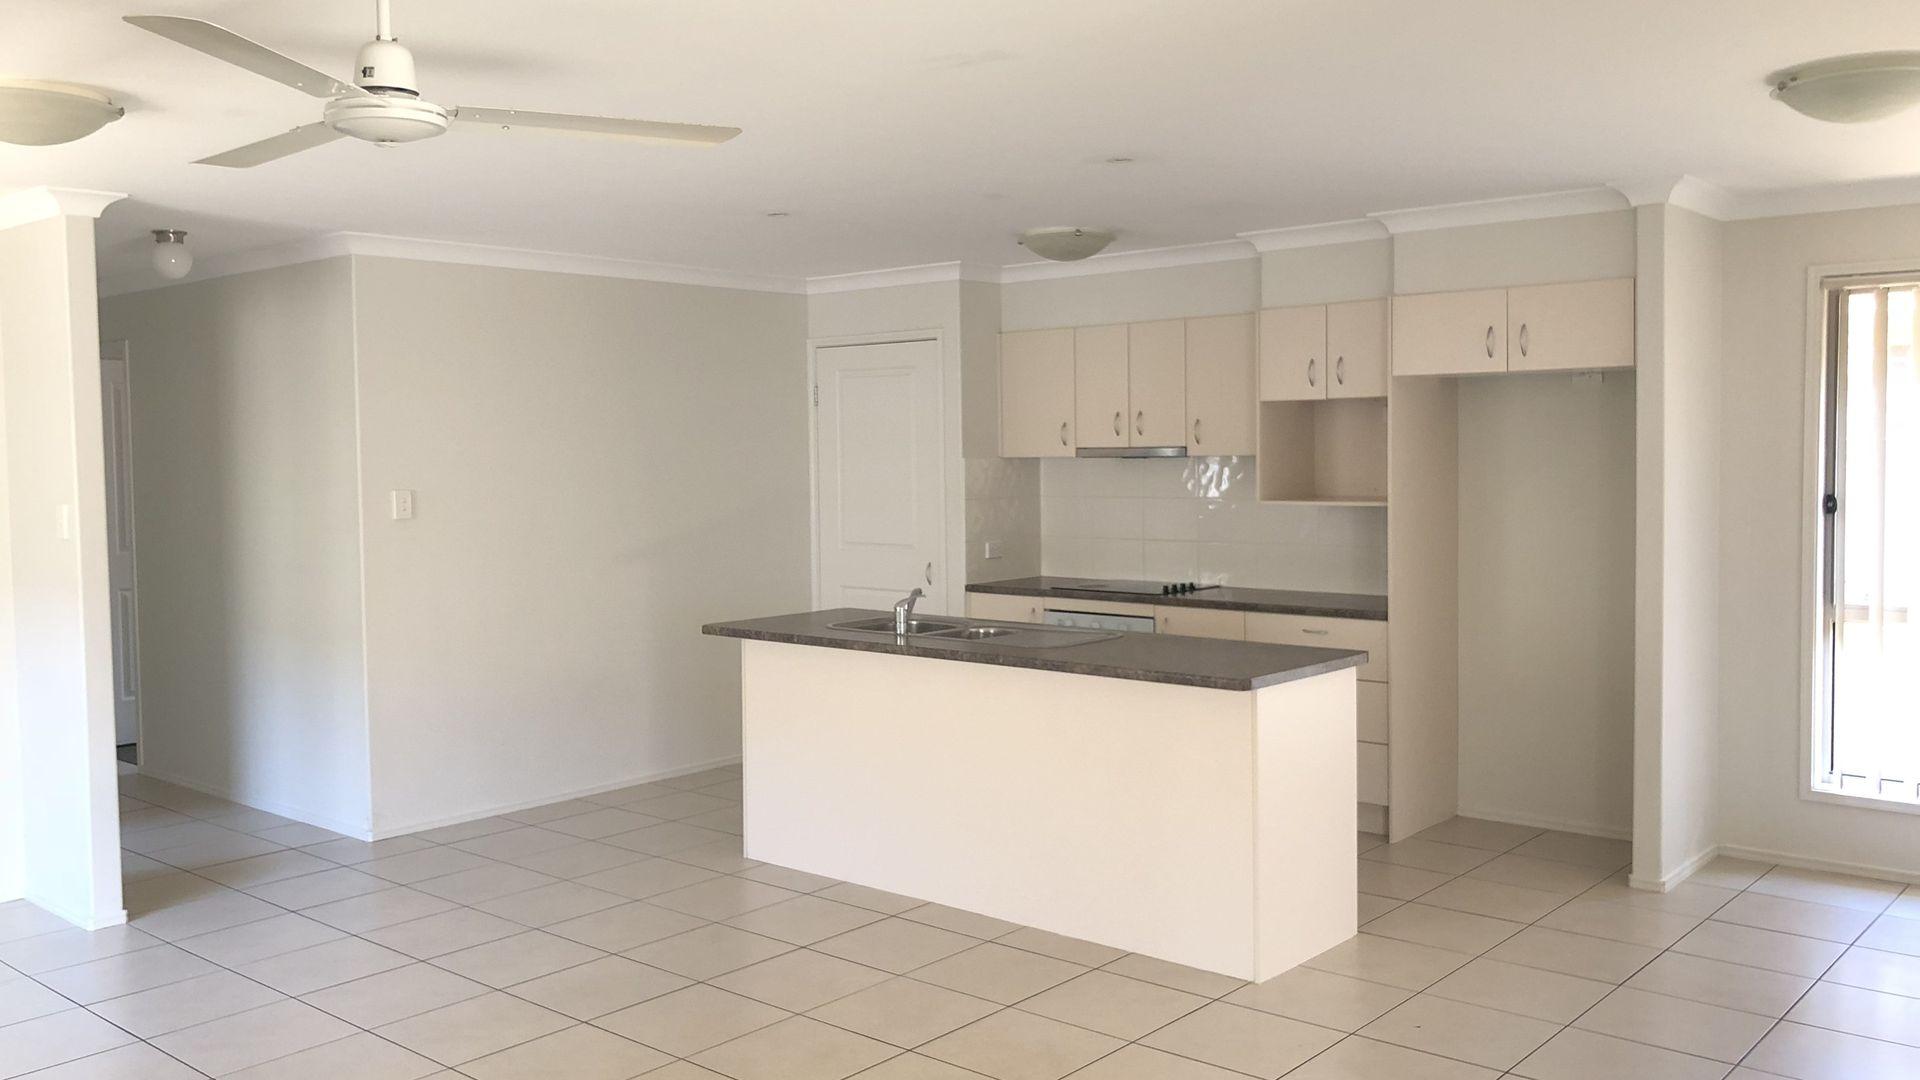 20/19-29 Nicole Street, Morayfield QLD 4506, Image 1